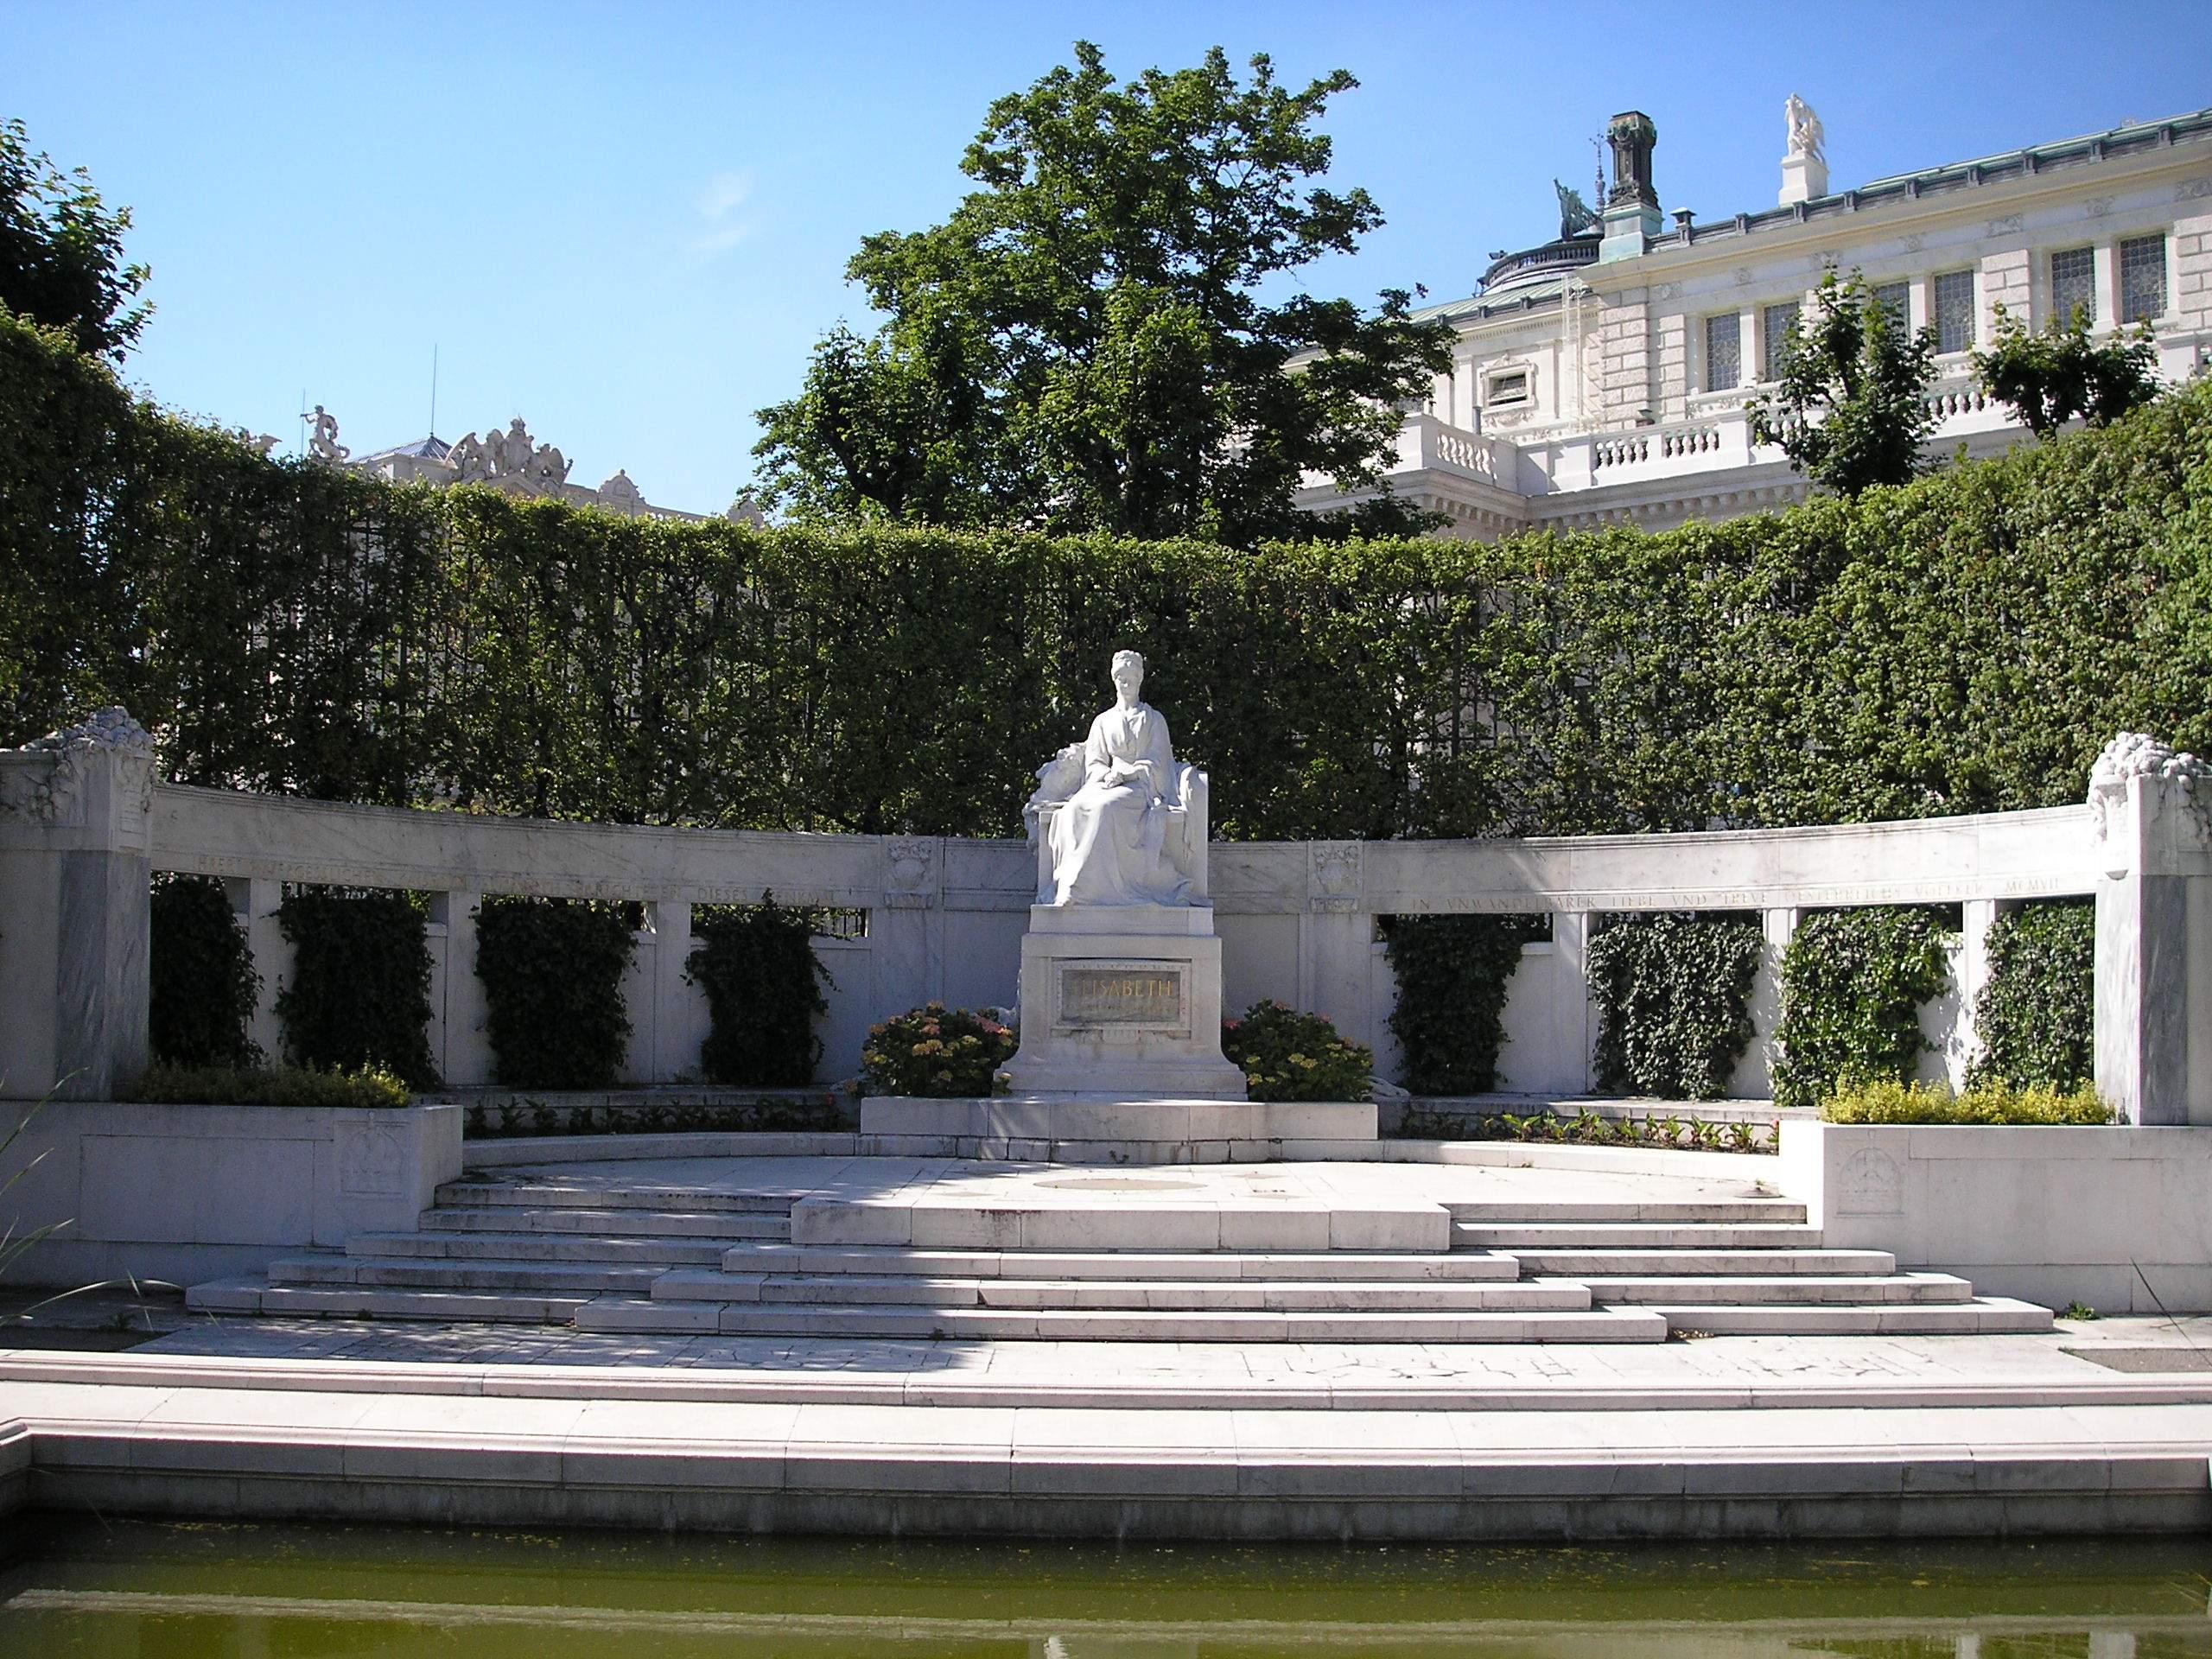 Inauguration VolskGarten 1907 La Statue Aujourd'hui